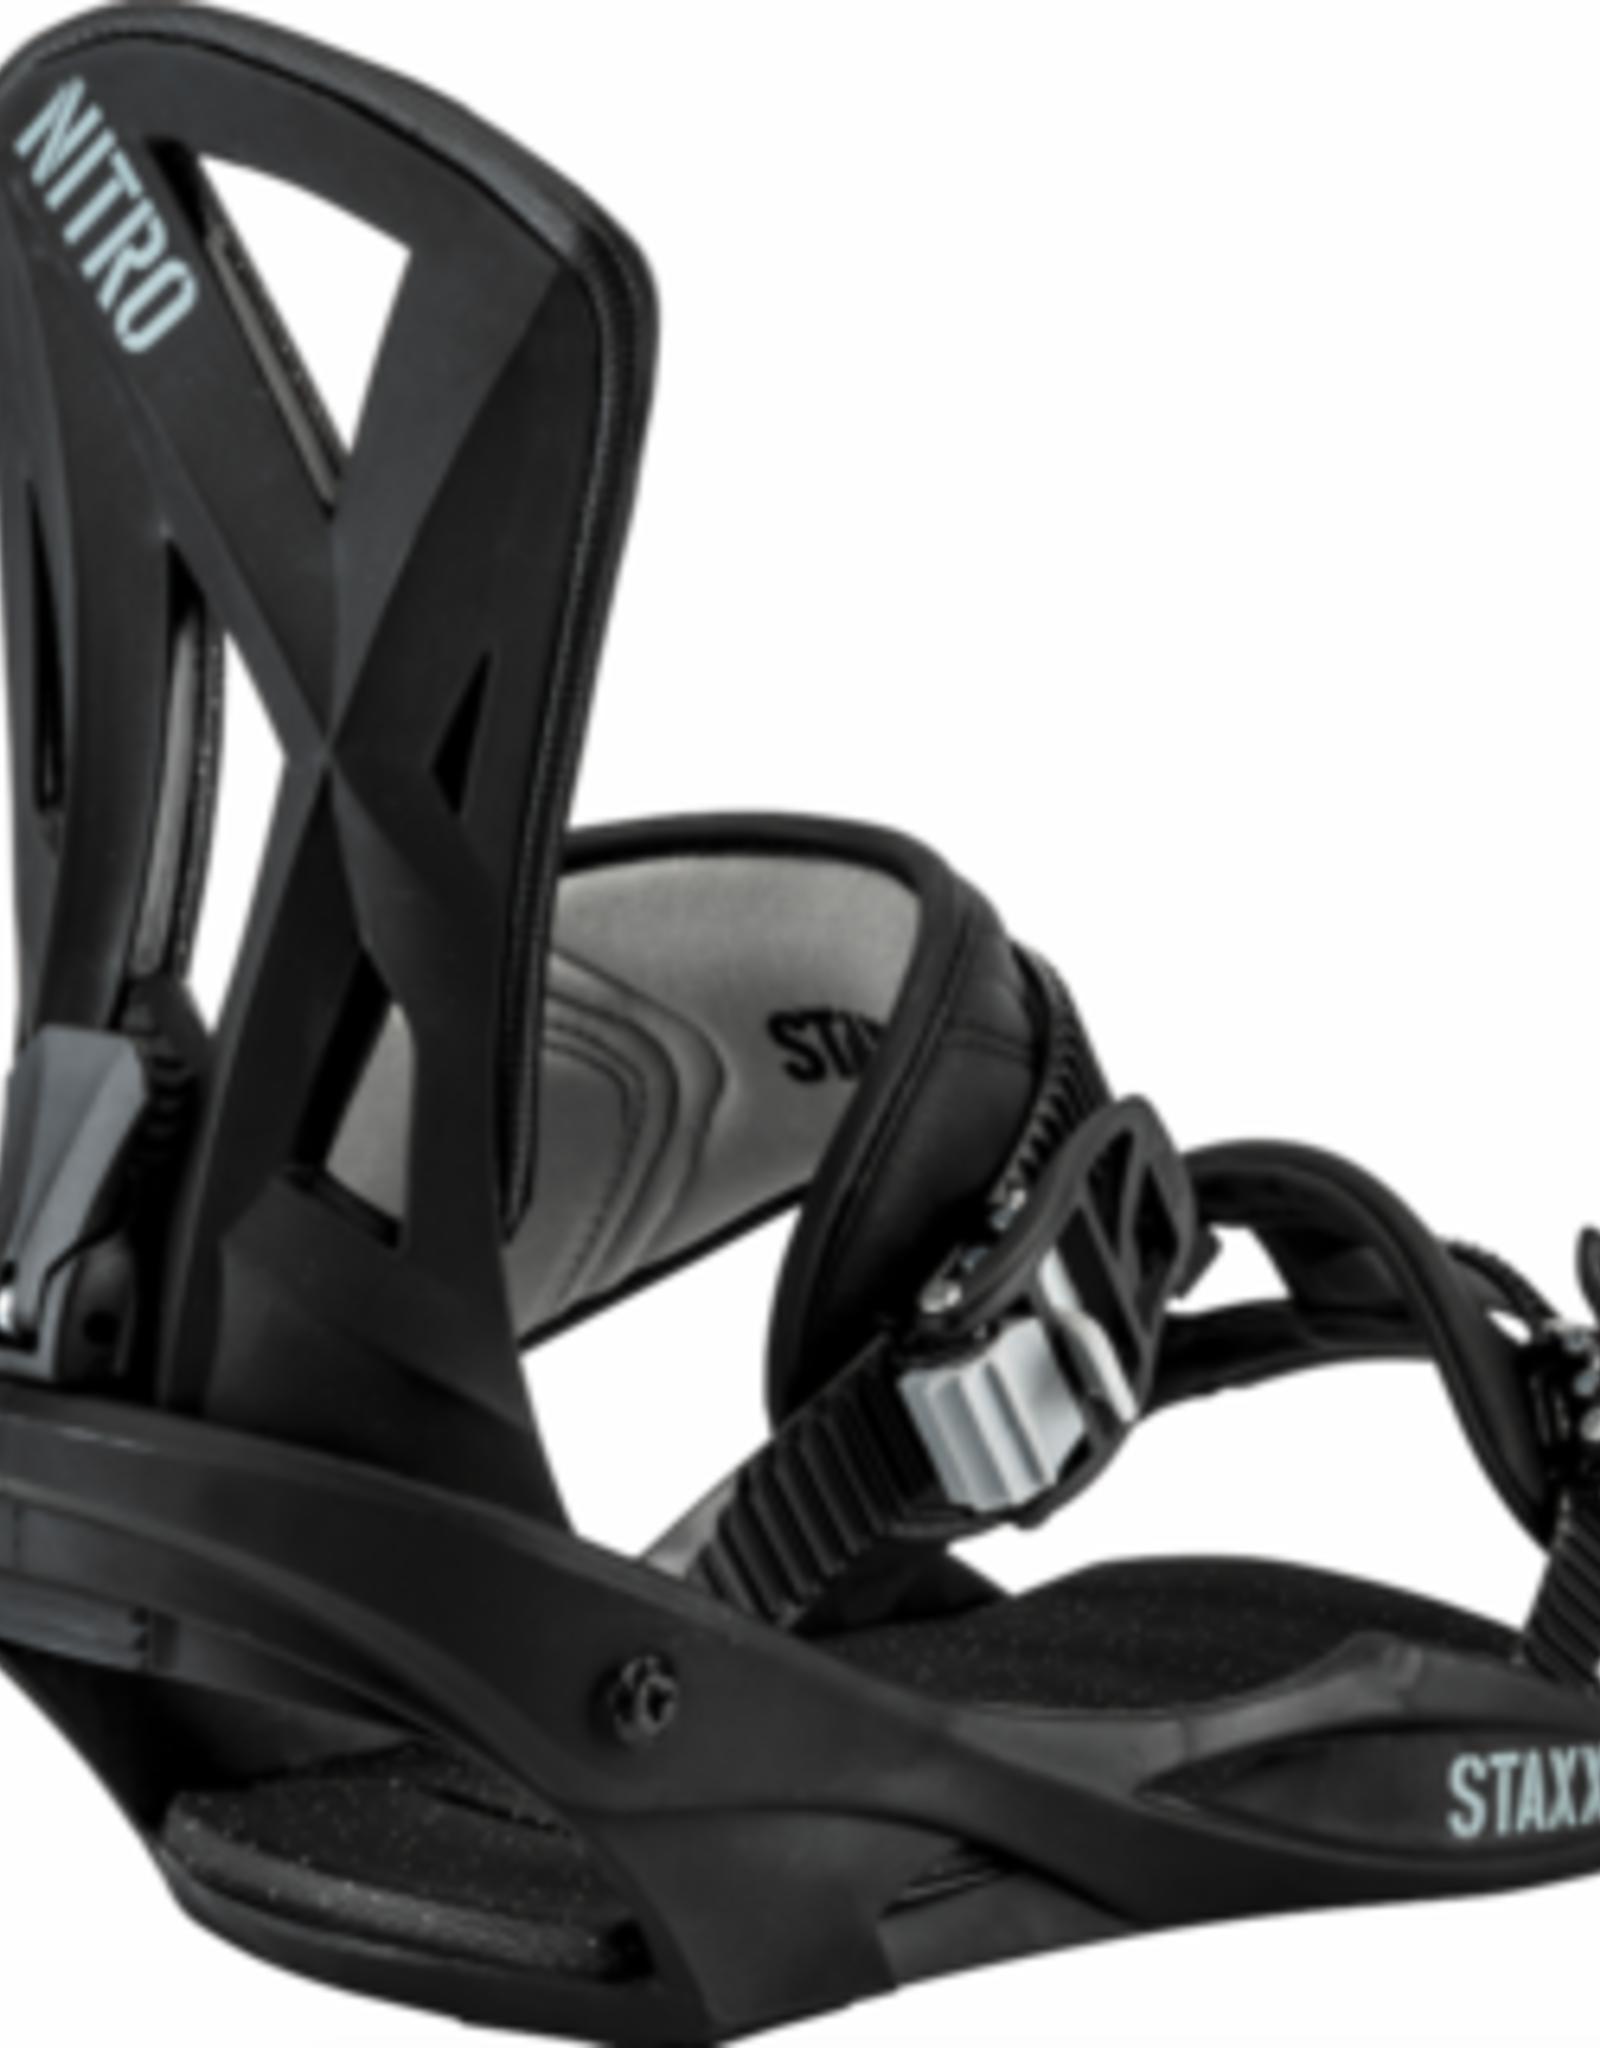 Nitro NITRO W21 STAXX BINDING